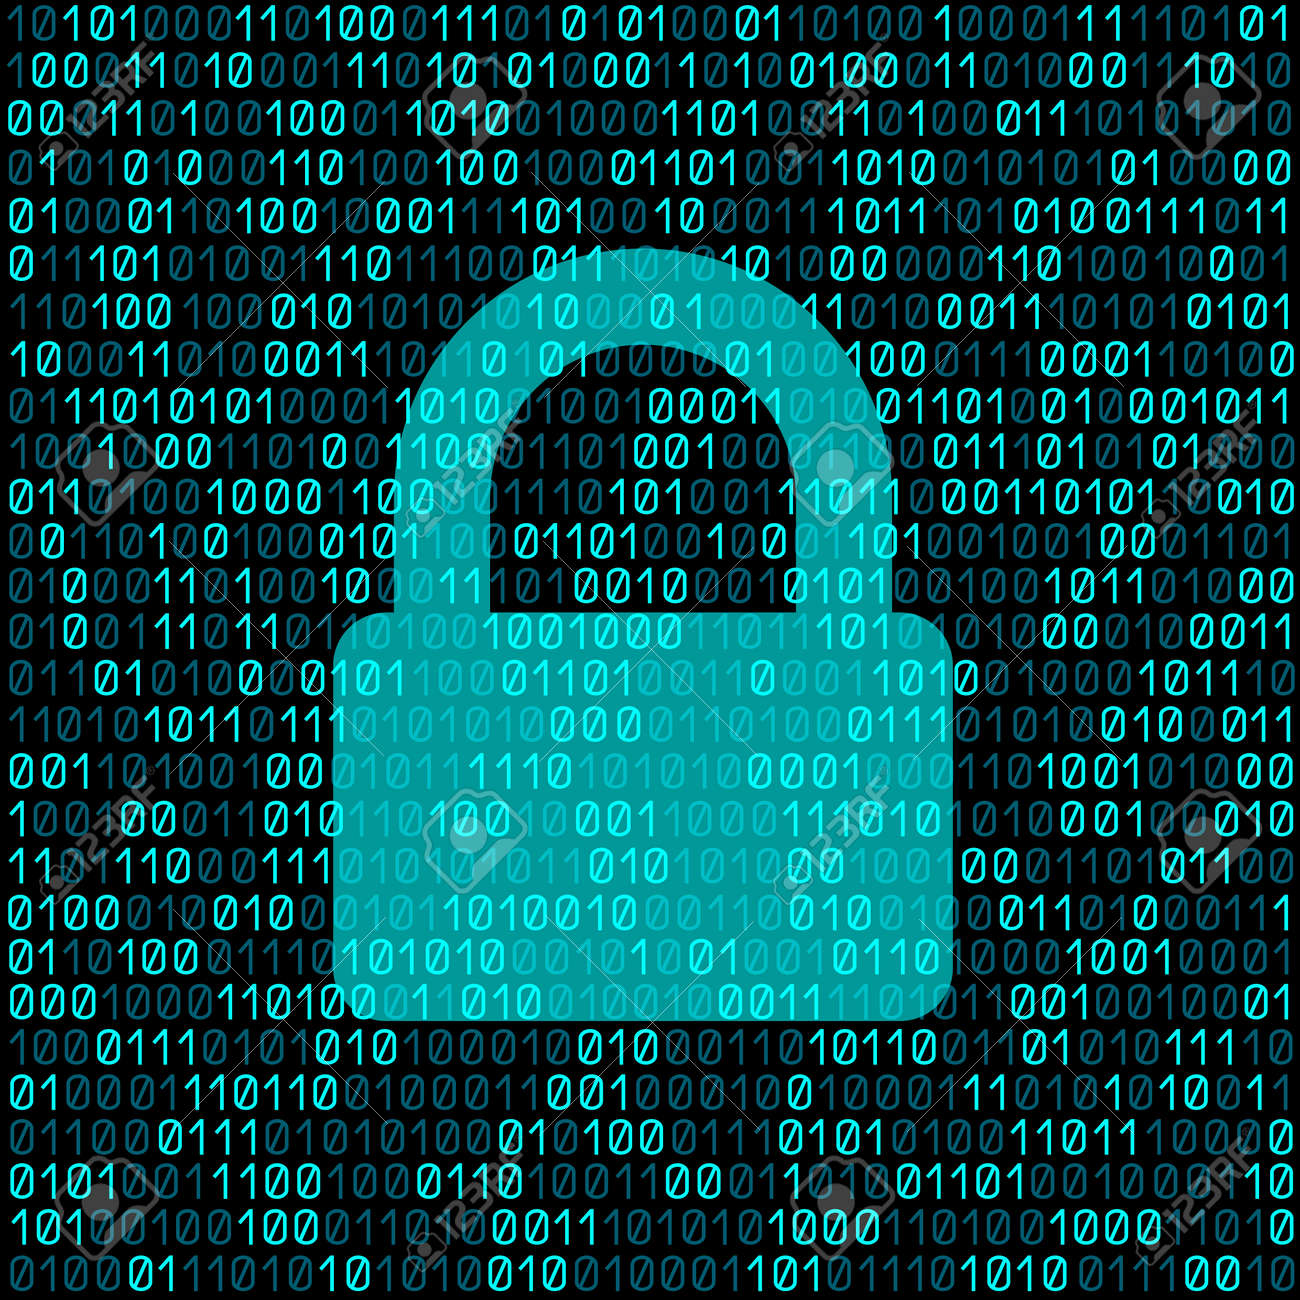 Closed transparent lock on blue cyber digital code background. - 82677912